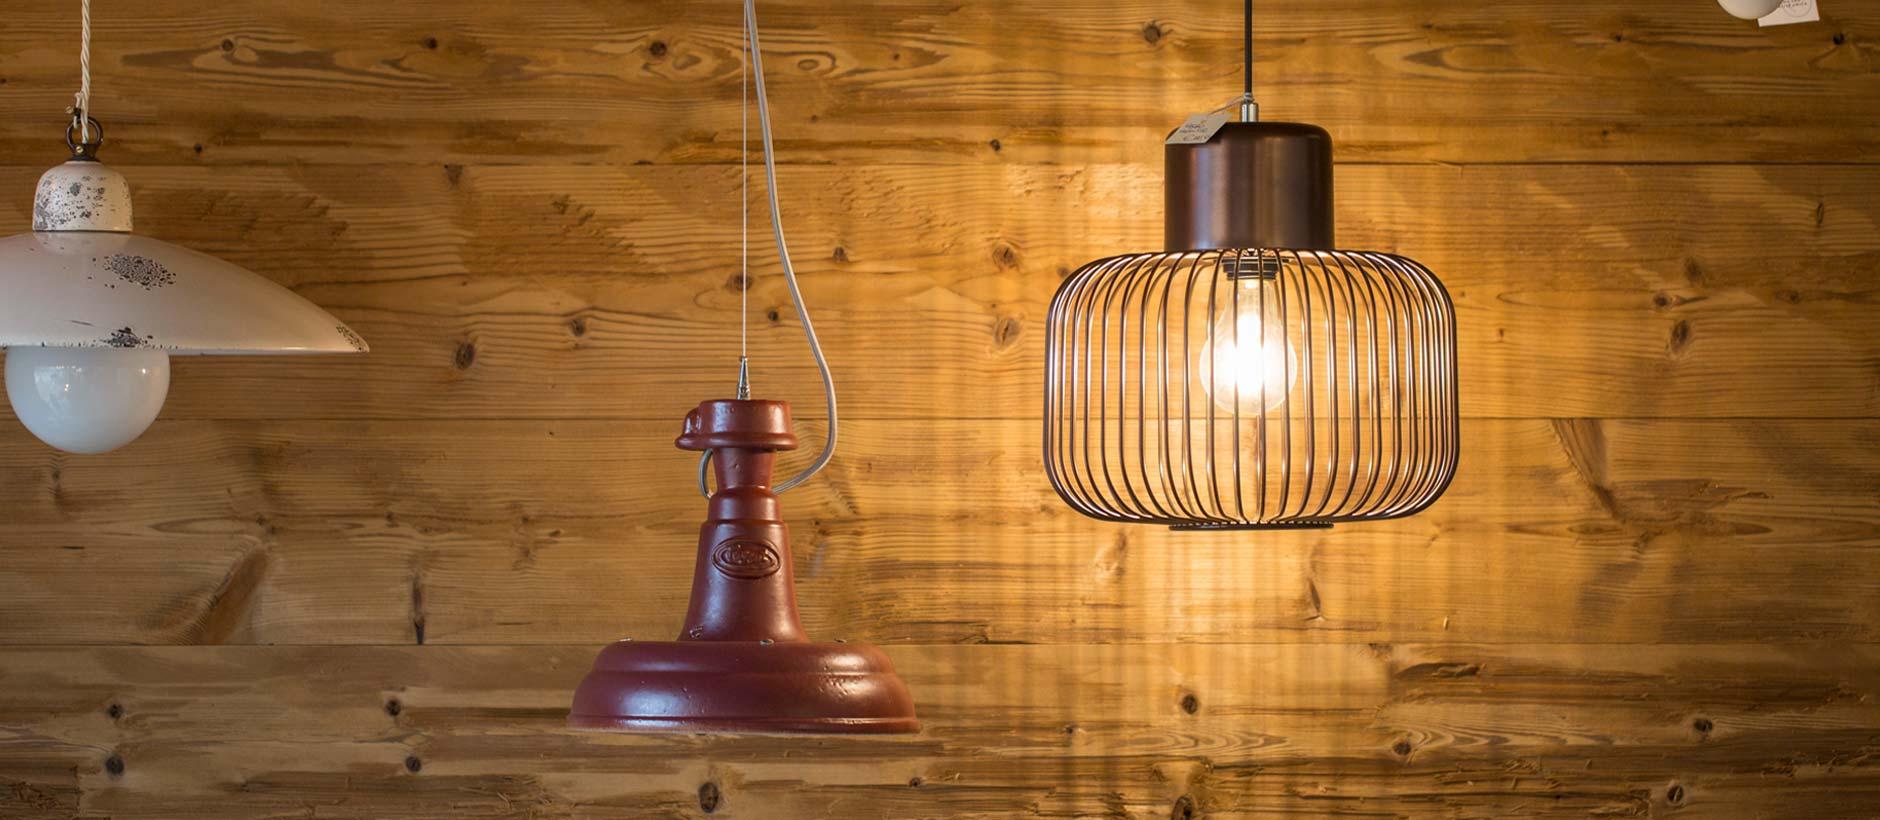 cdl-luce-consulenza-illuminotecnica-vendita